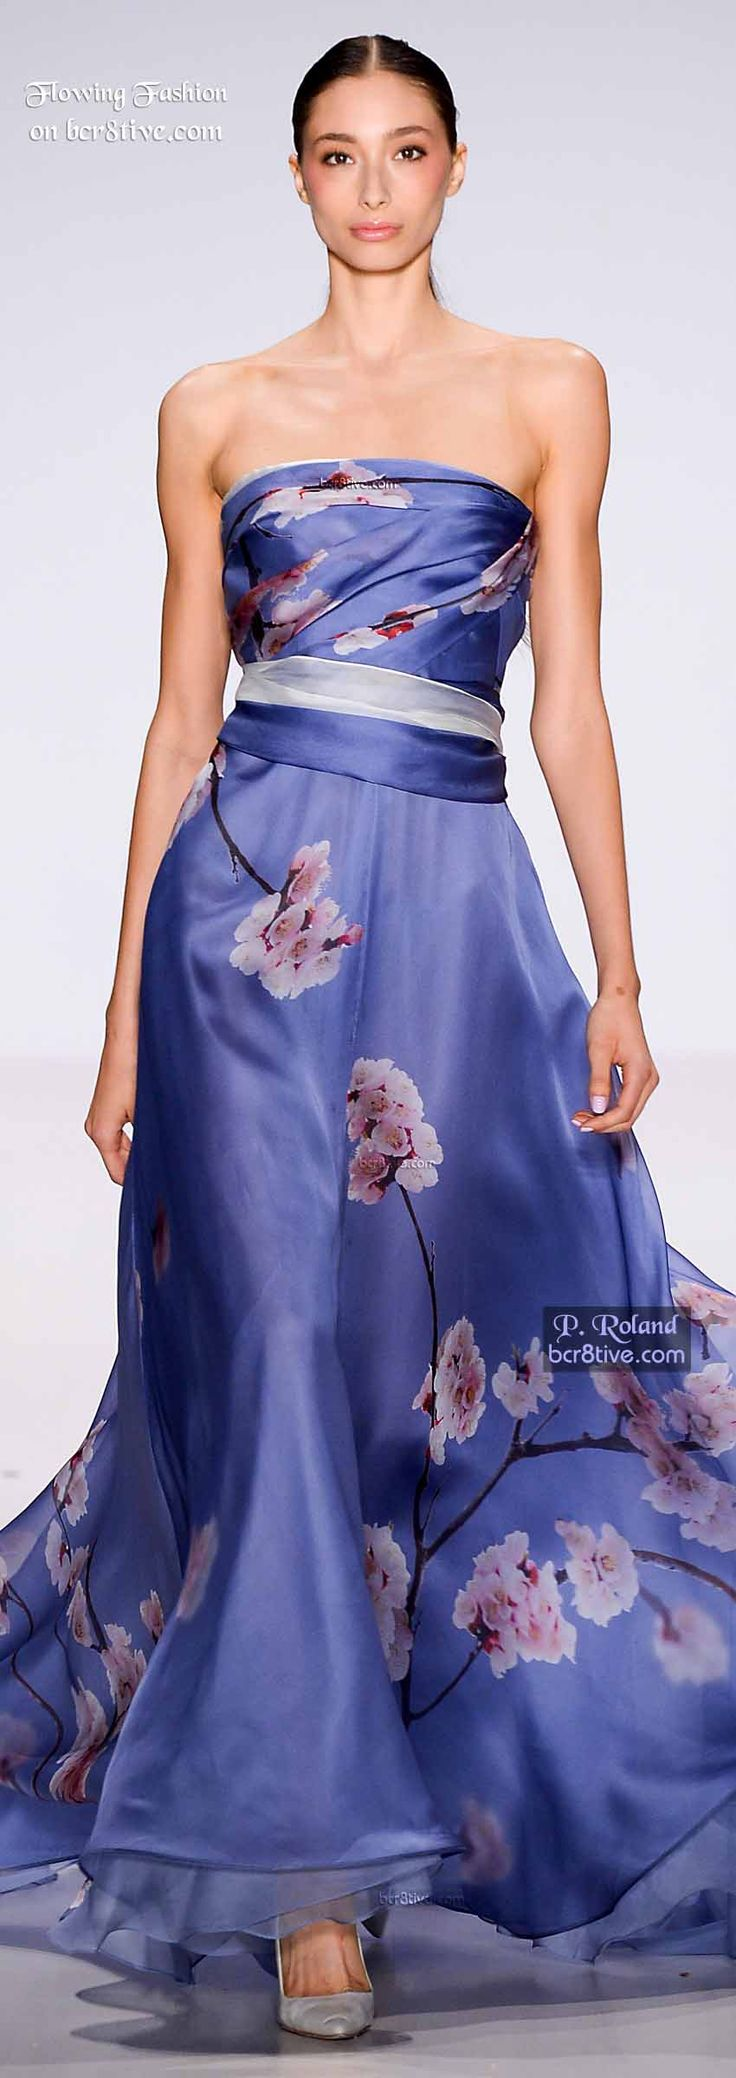 427 best Vestidos images on Pinterest | Party wear dresses, Party ...